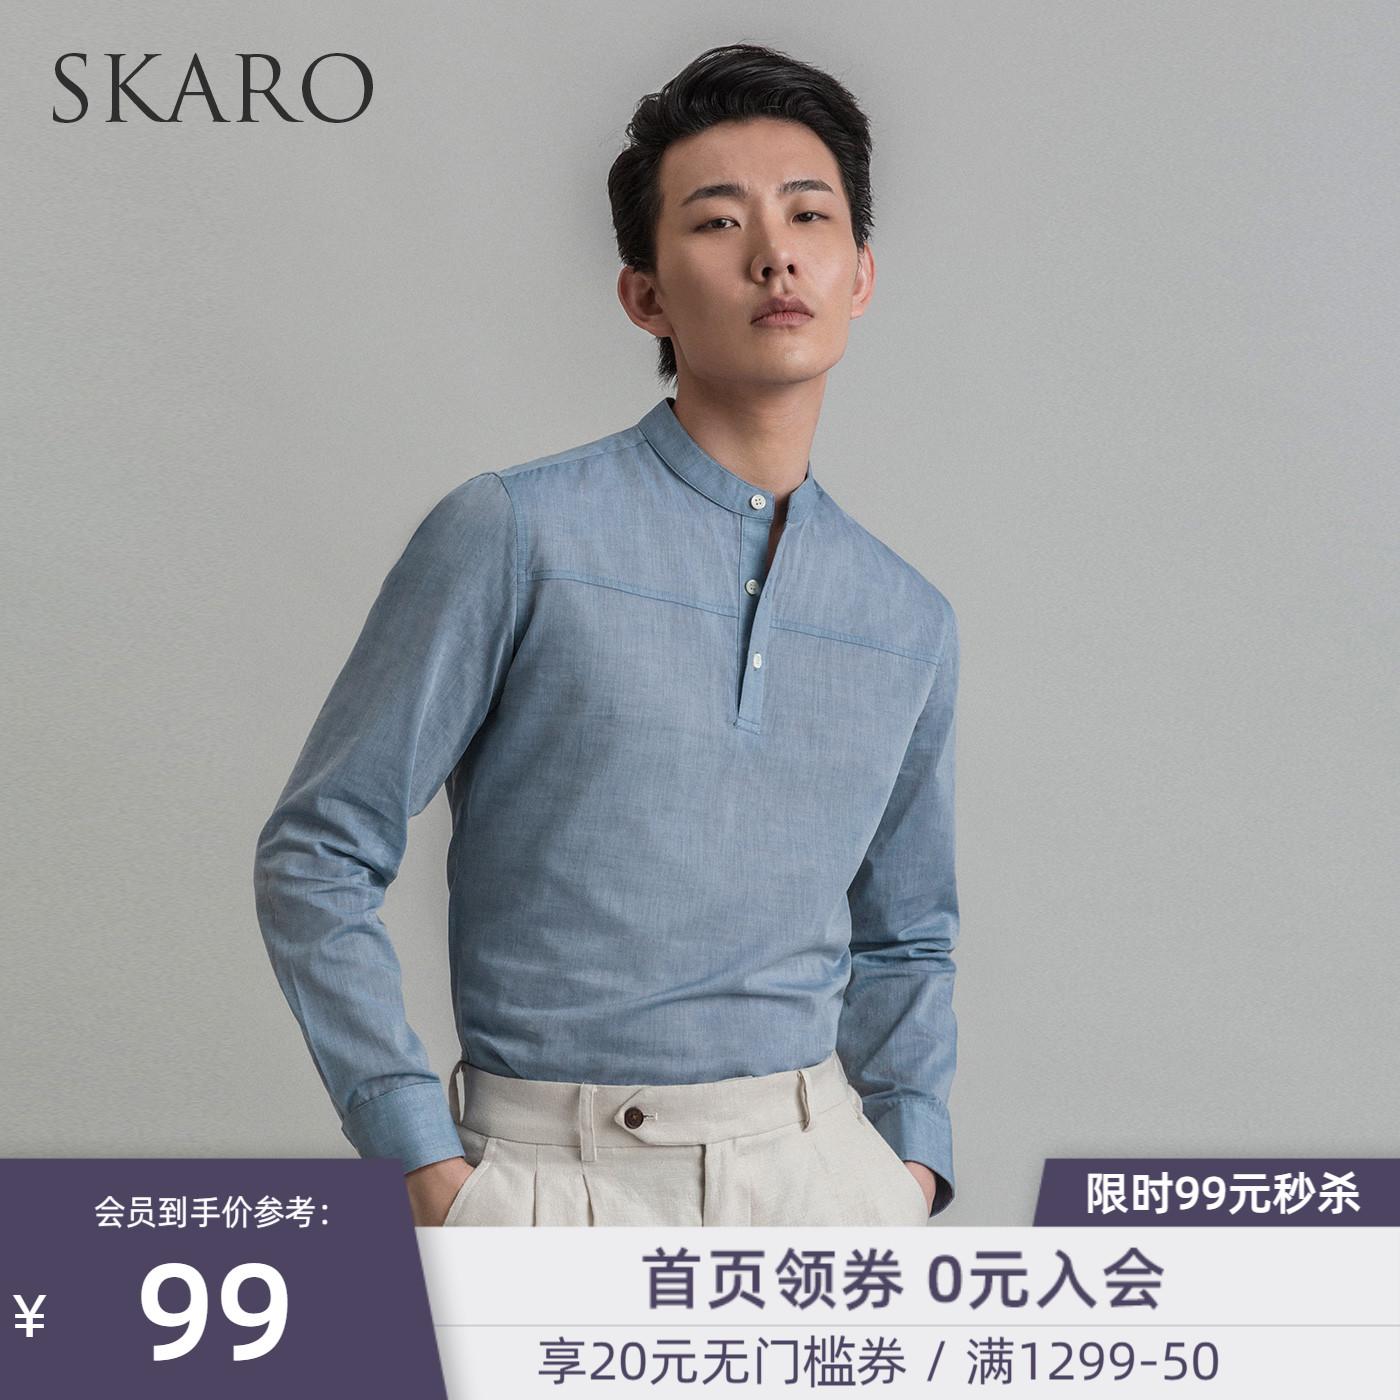 ThomWills男装SKARO男士立领衬衫纯棉透气休闲修身长袖亨利领衬衣